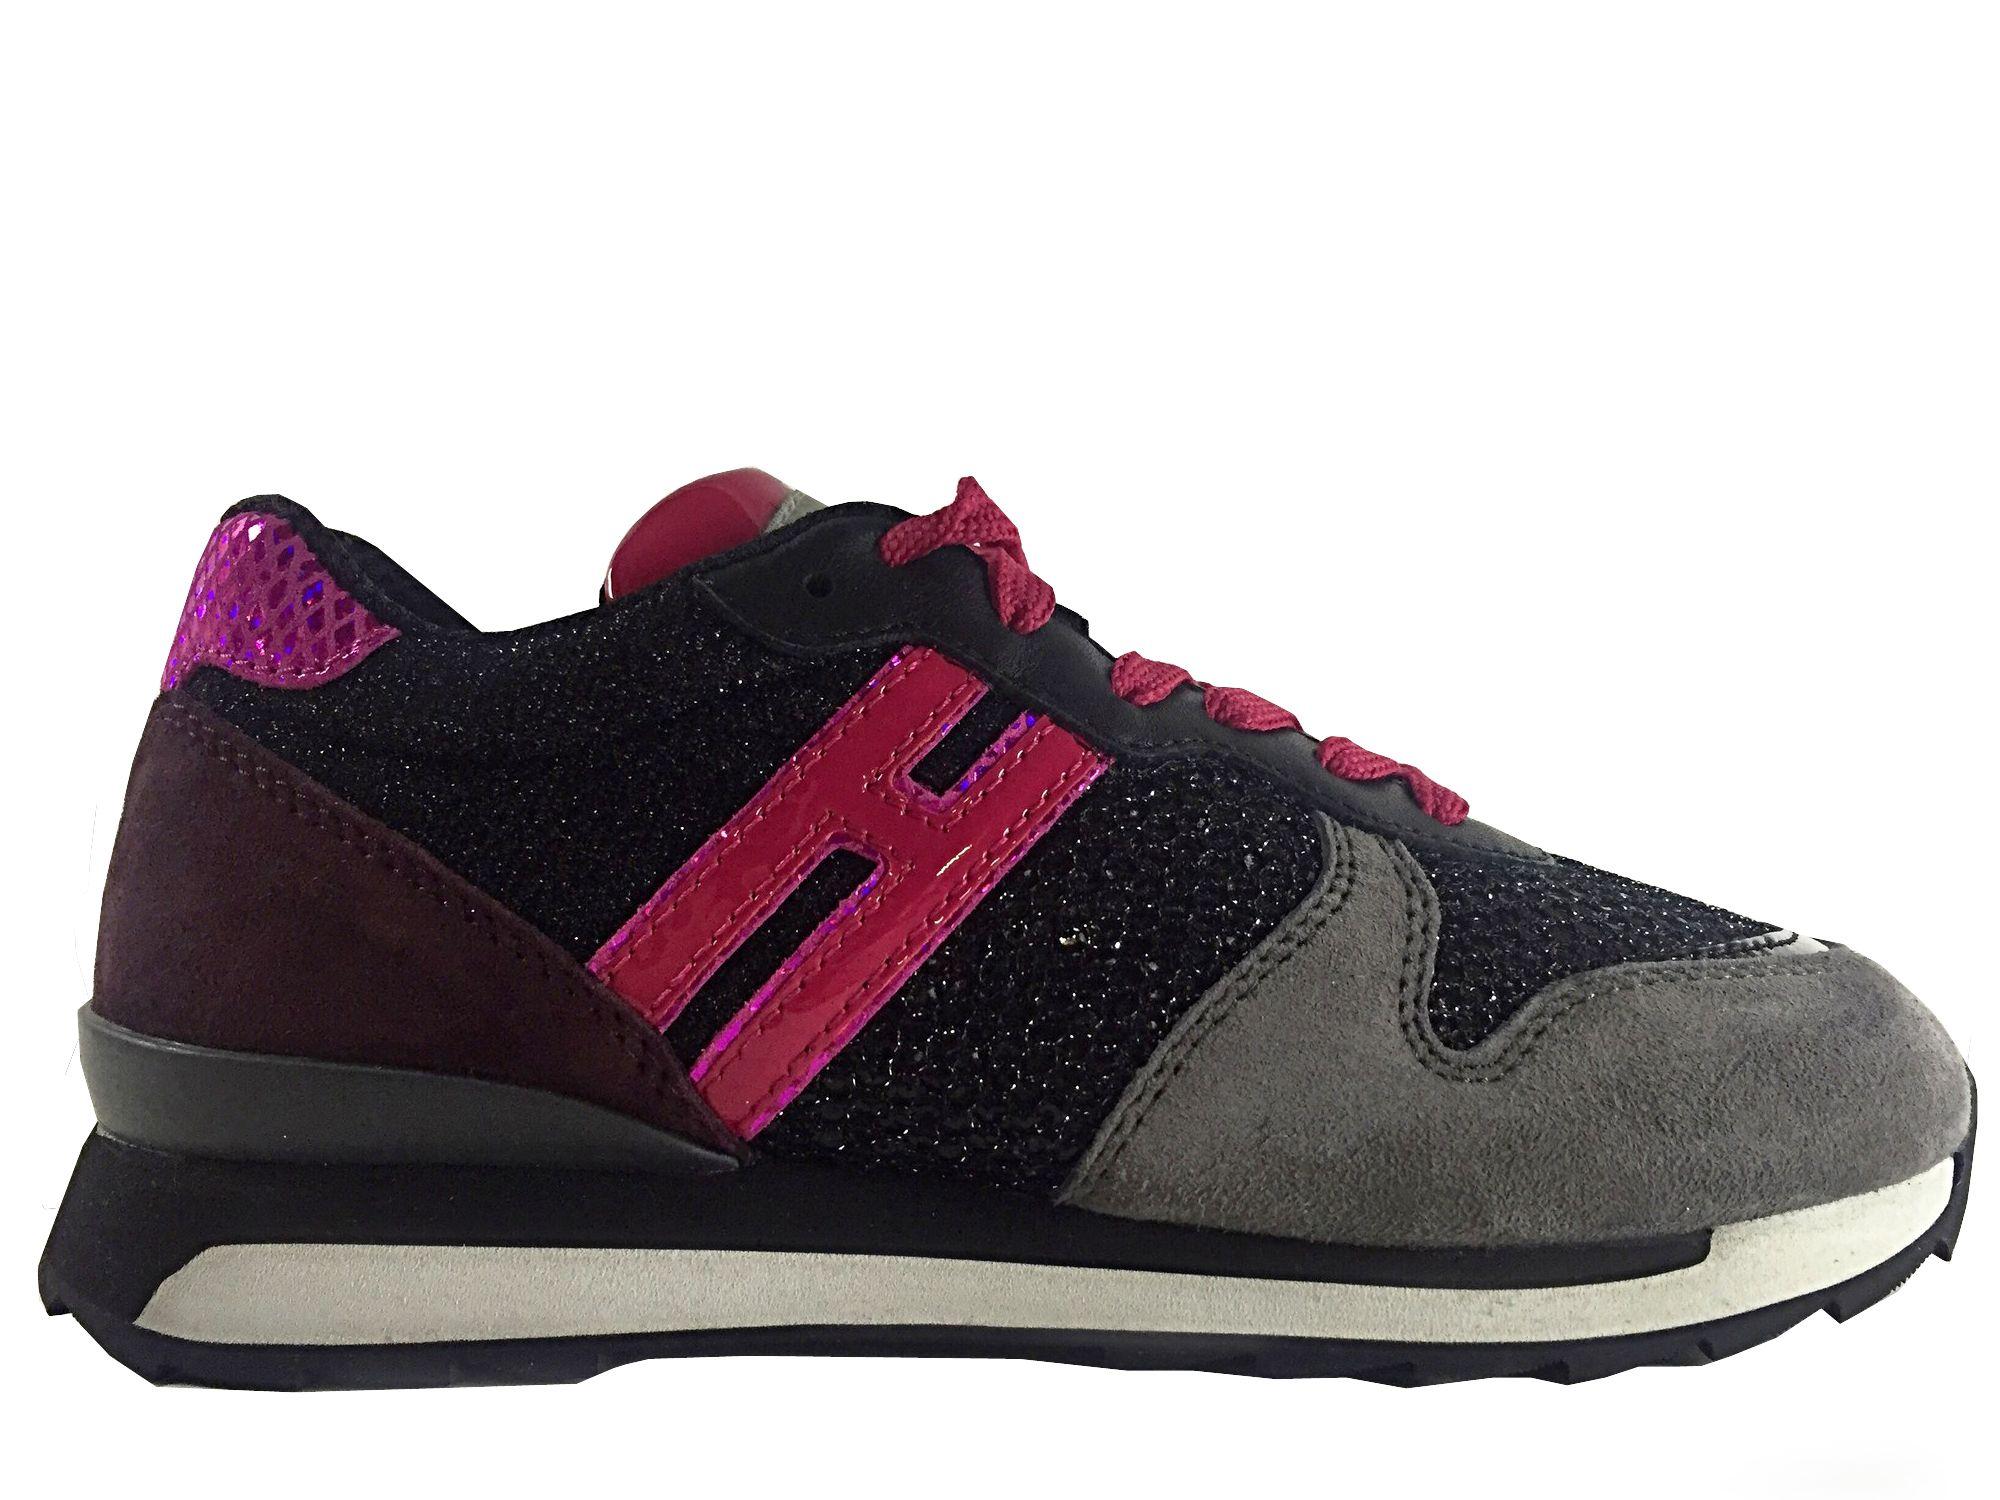 best service b5812 44304 ... norway jordan cp3.ix ae hombresta verde zapatos on venta bd0a3 0cdca